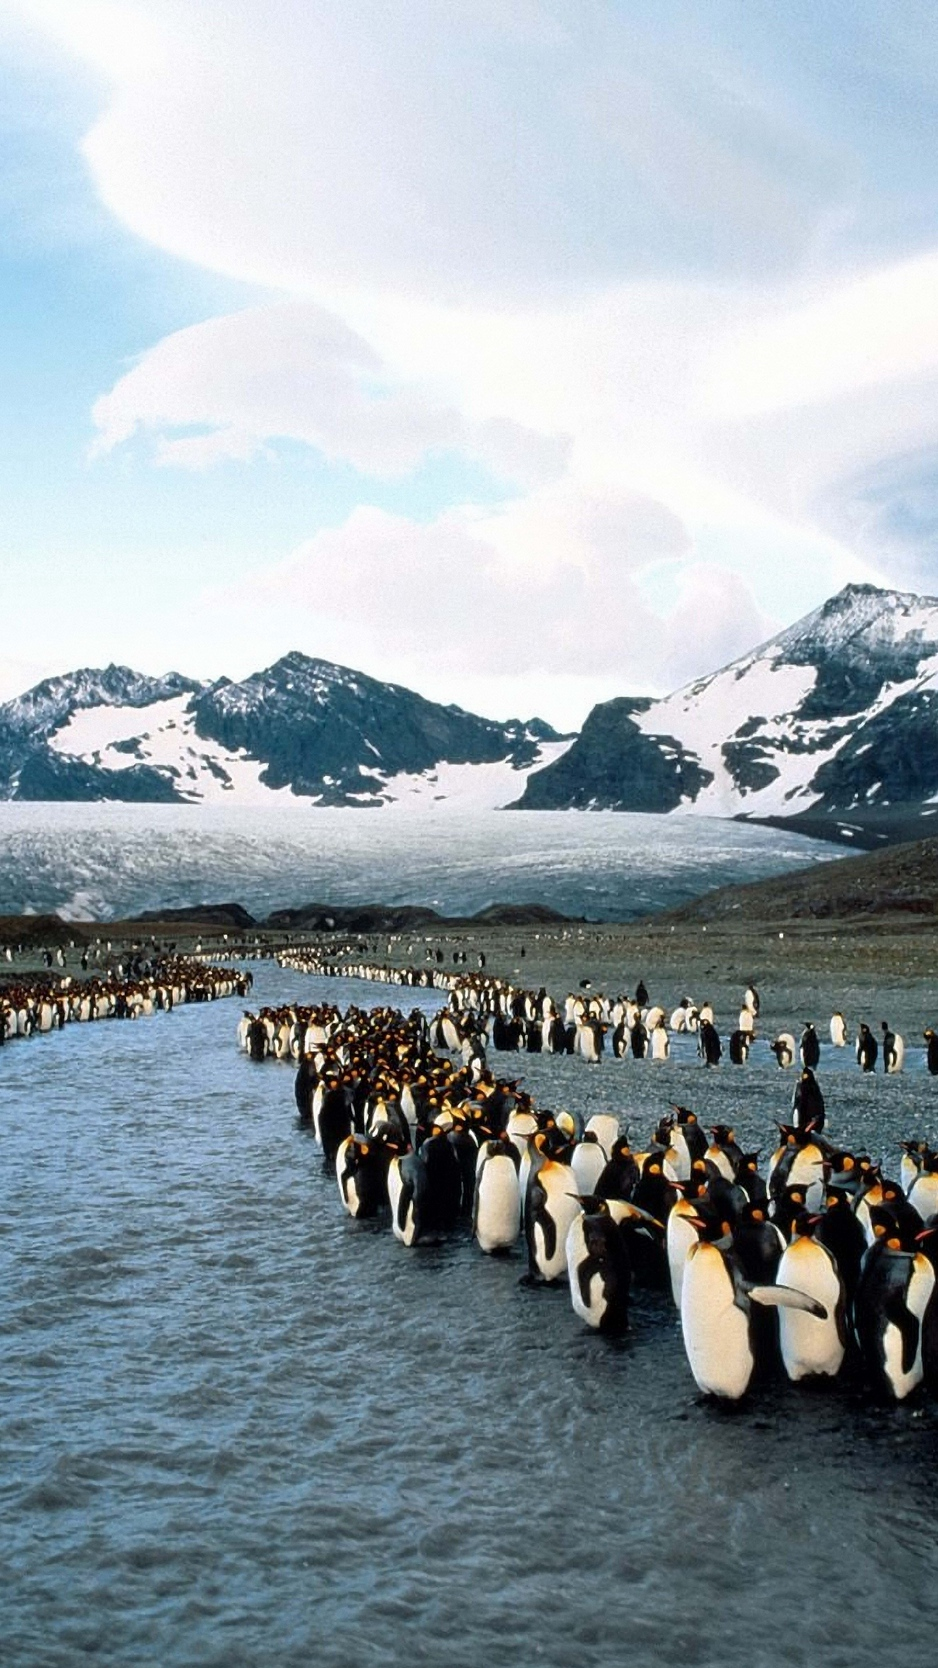 Download wallpaper 938x1668 penguins north mountains flock 938x1668